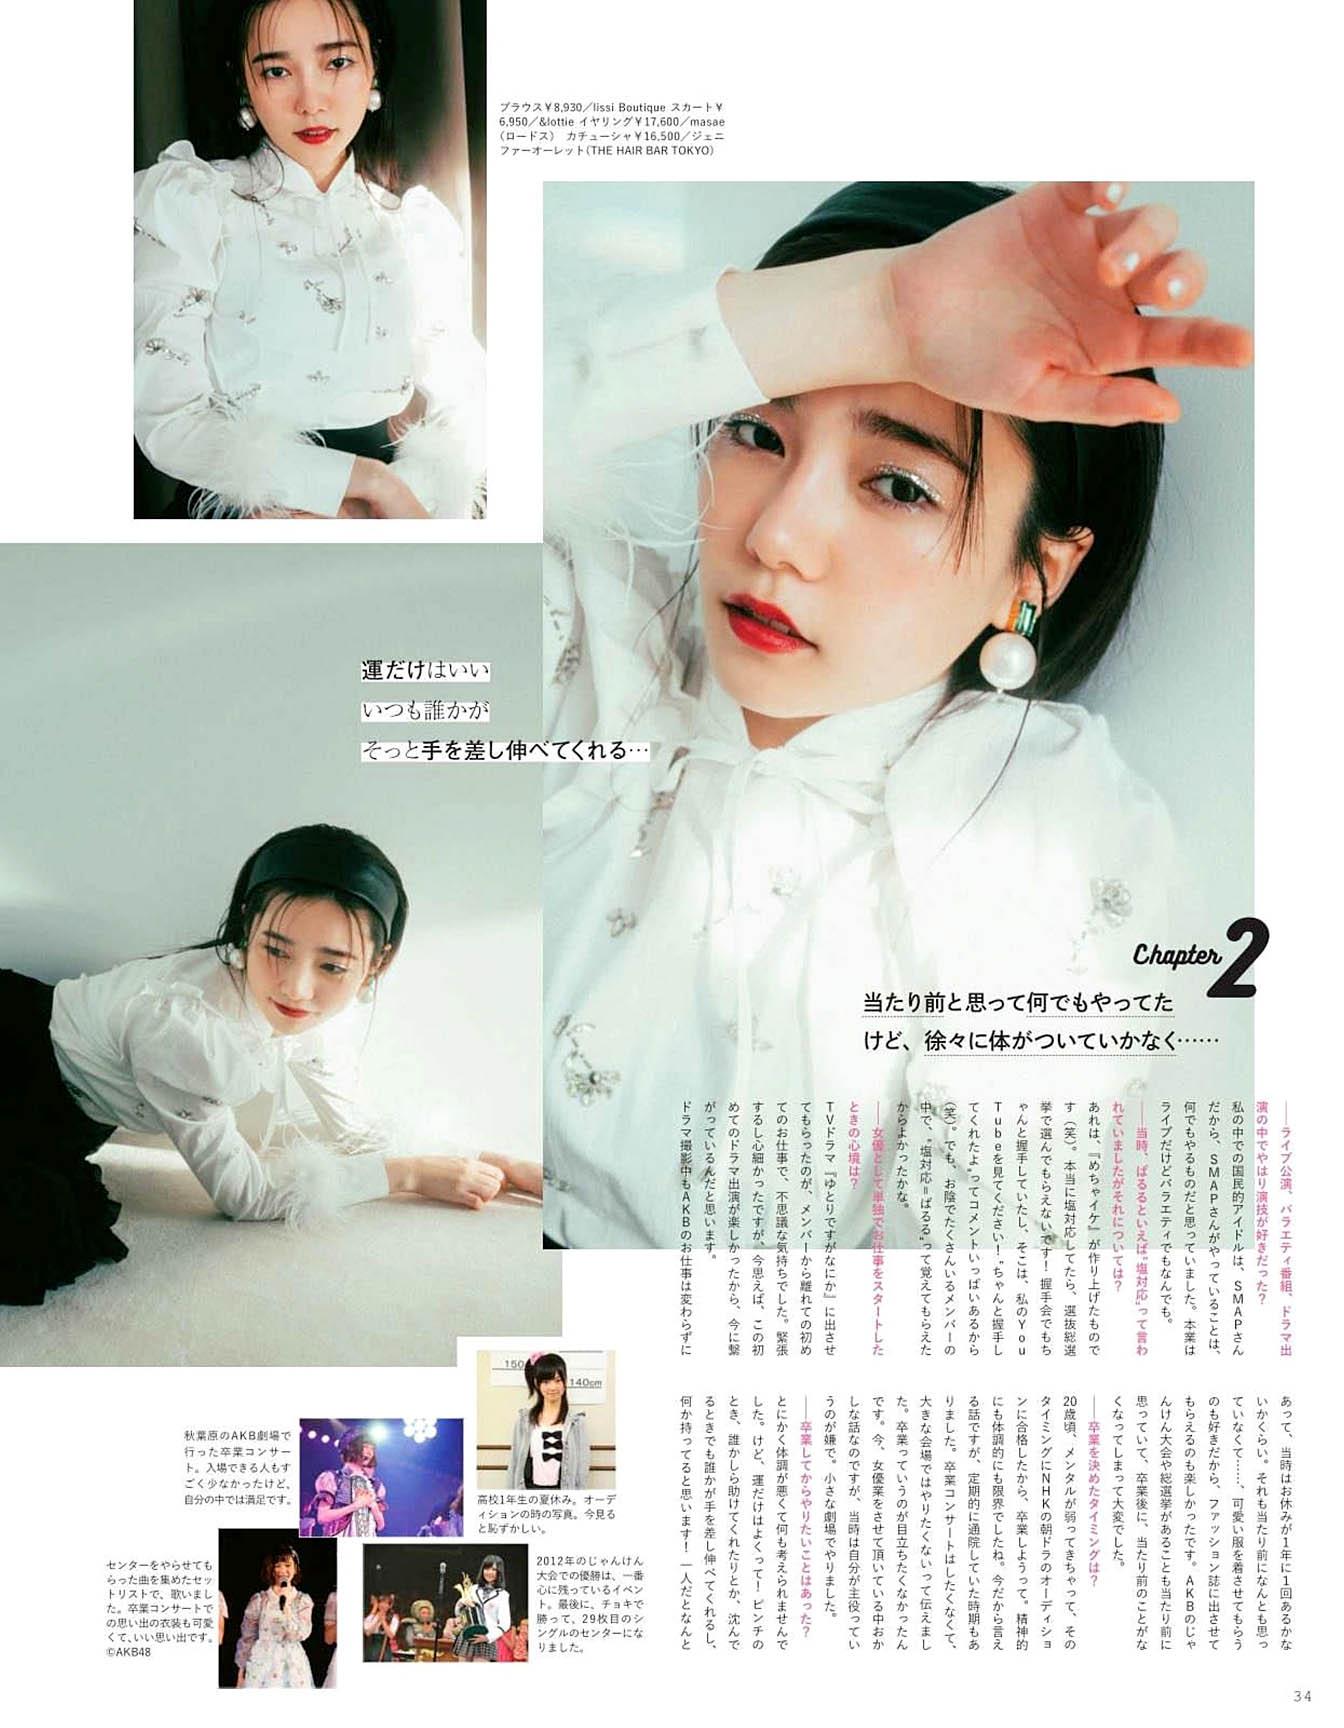 HShimazaki Peche 2108 02.jpg